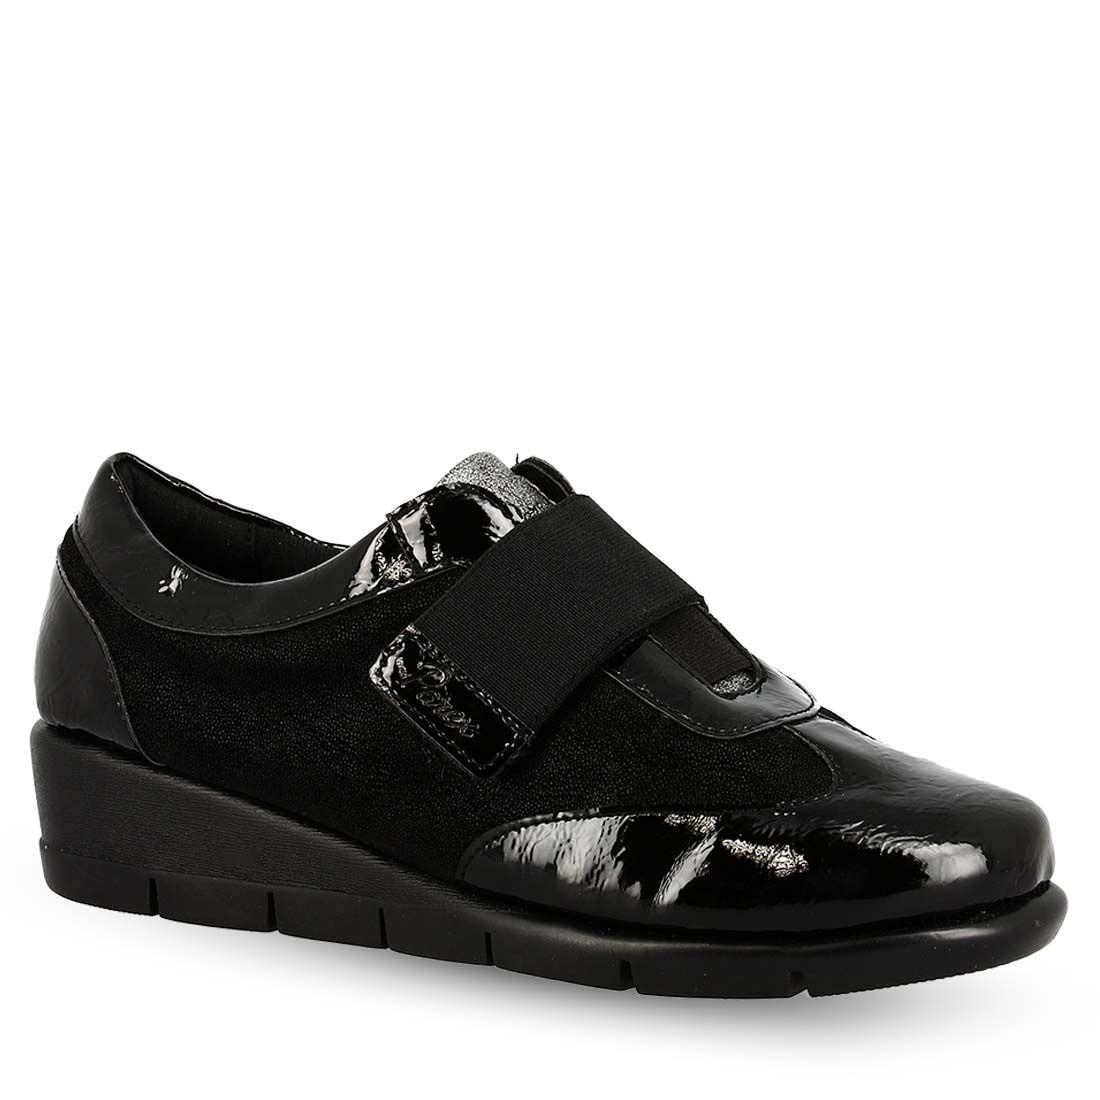 PAREX Γυναικεία Παπούτσια Sneakers 10720010.Β Μαύρο